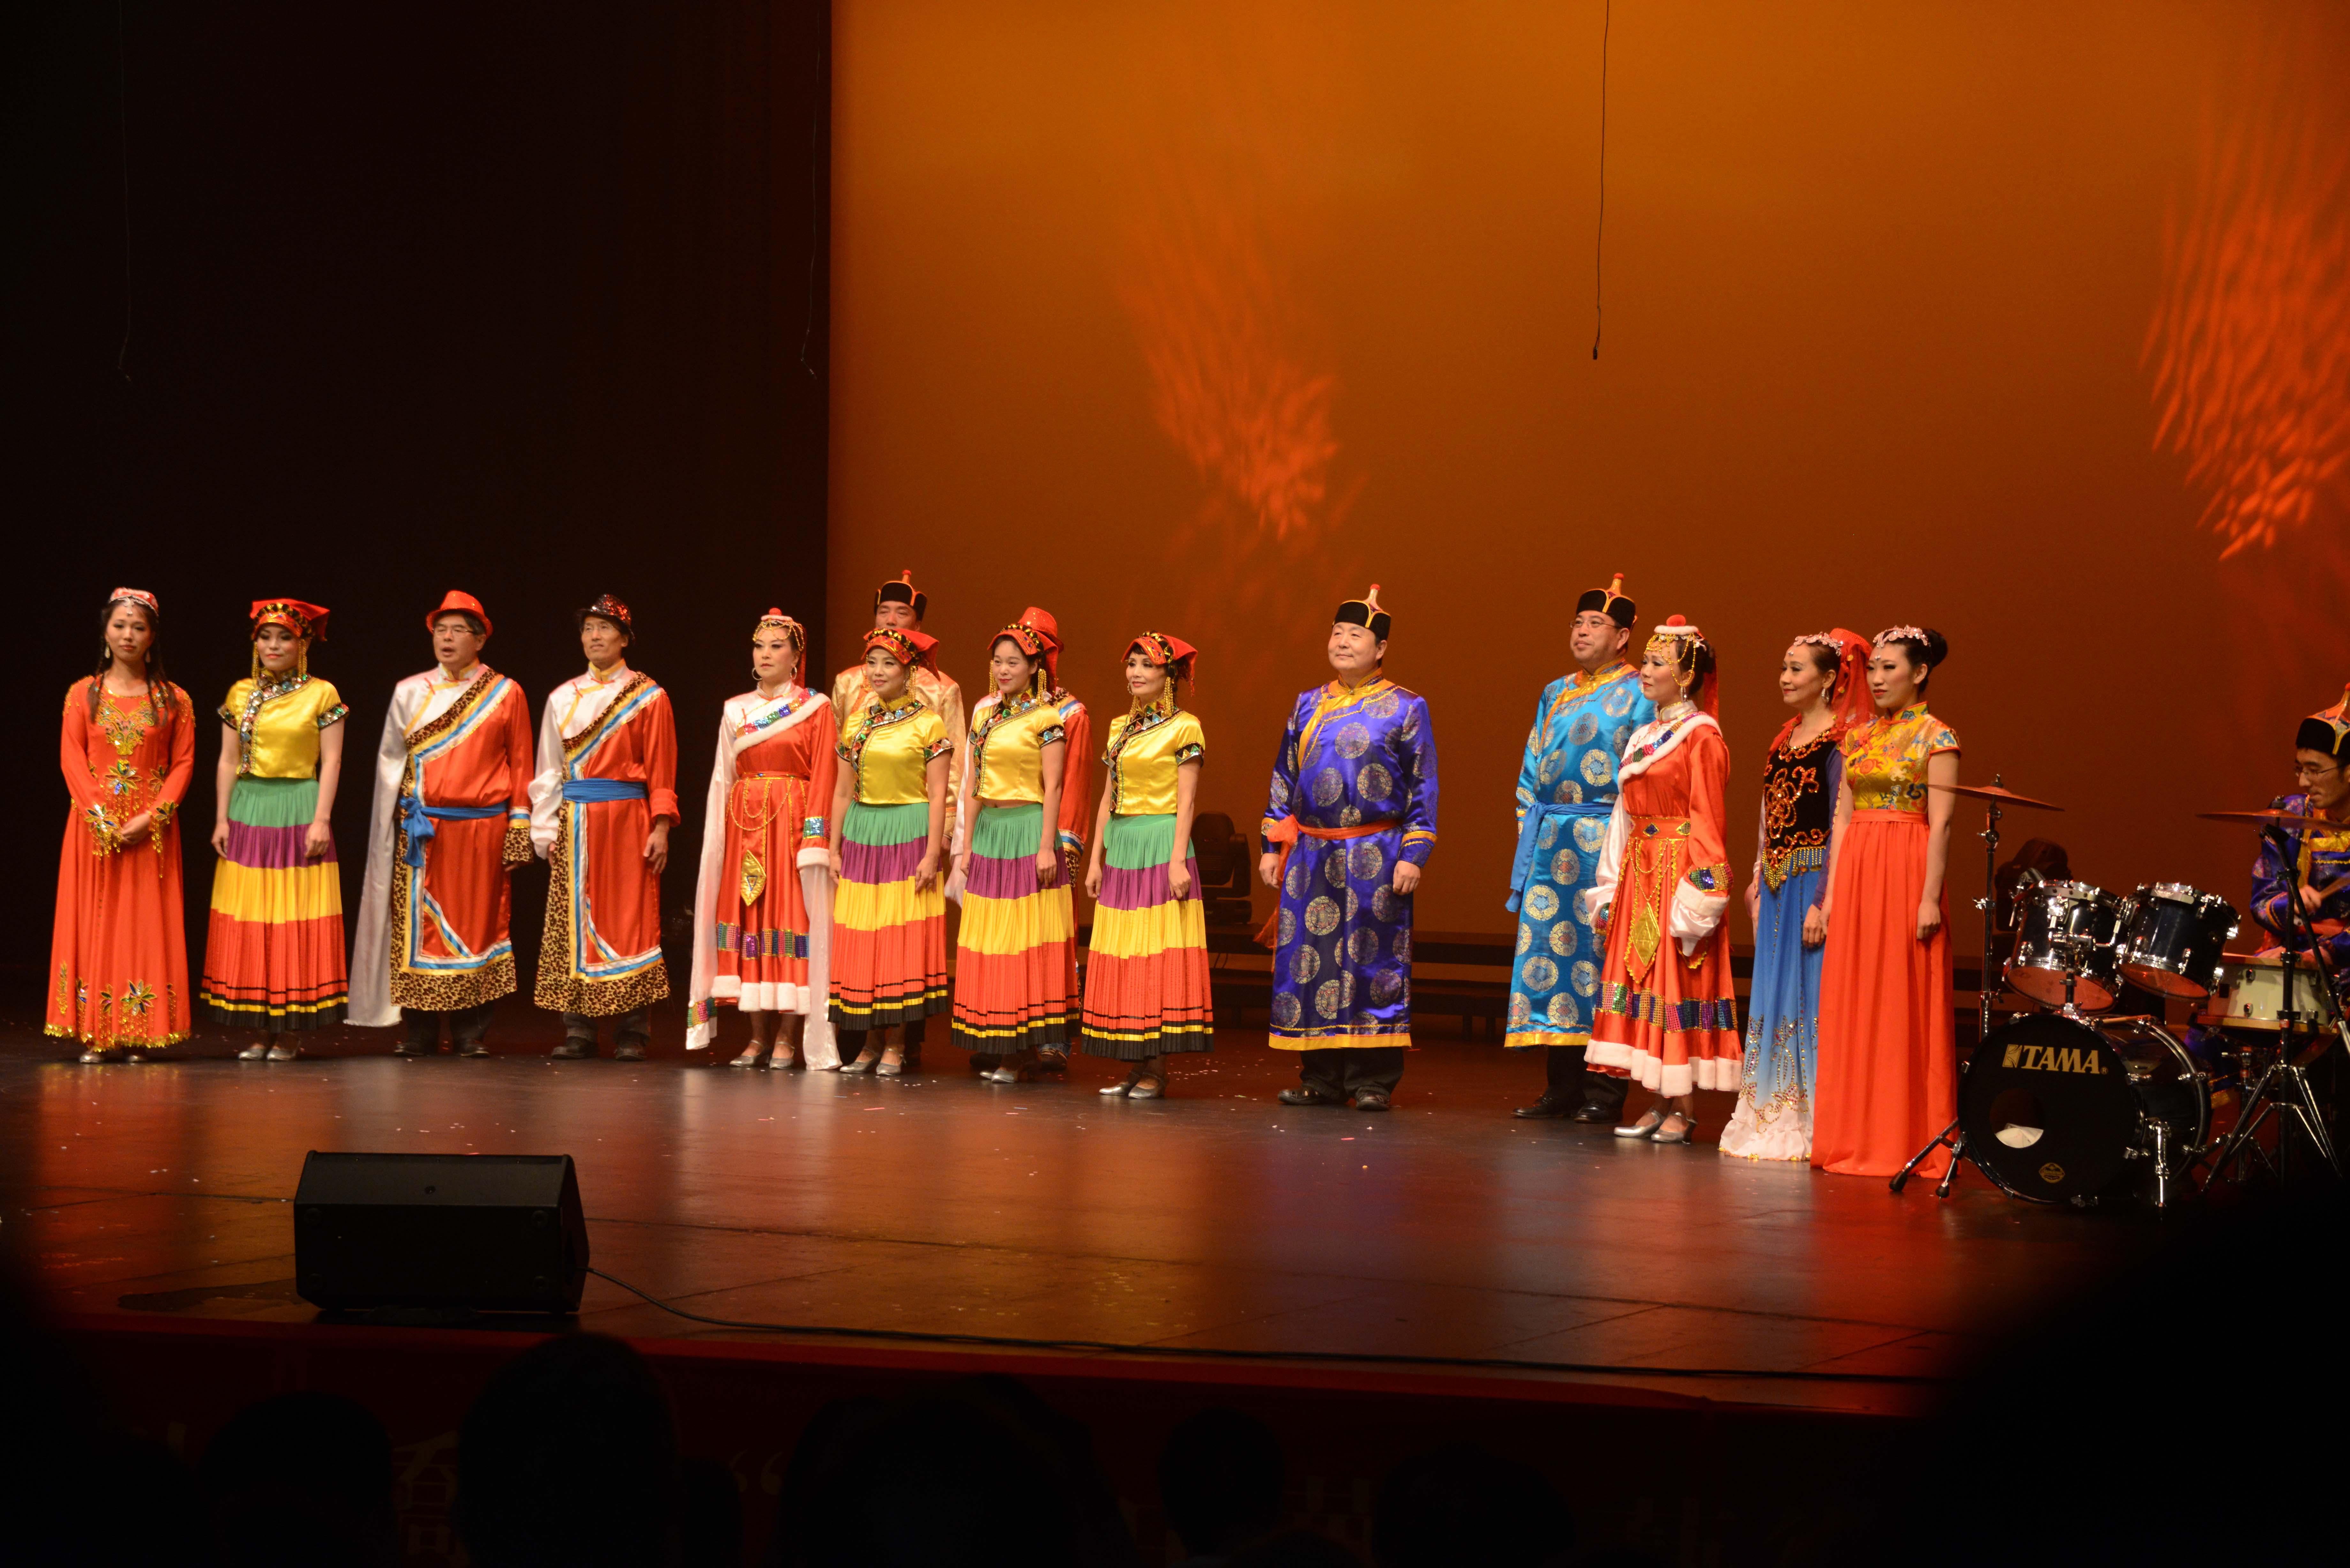 2014 September 18th Performance Image 483